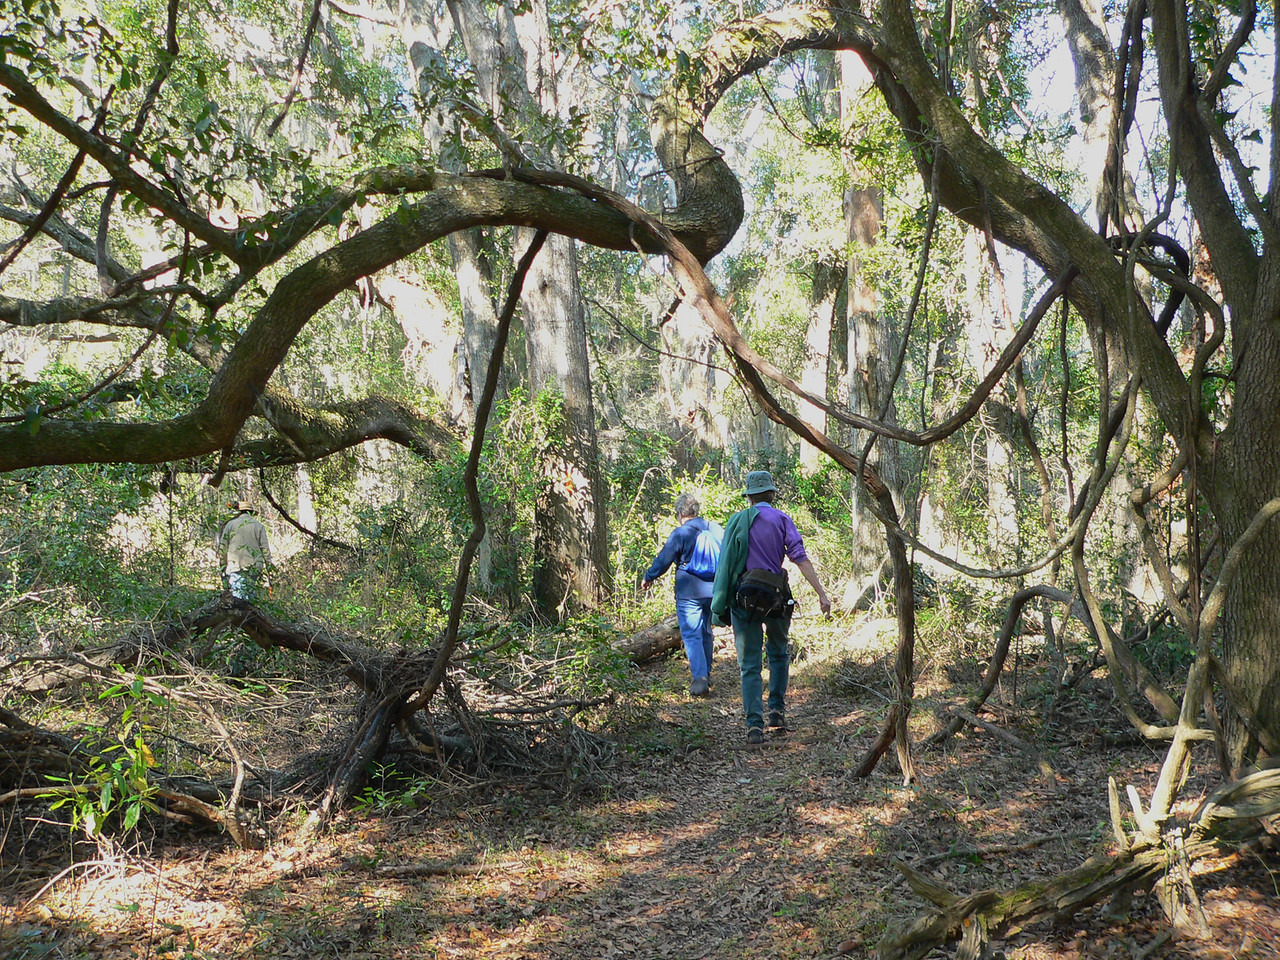 Under gnarled oaks<br /> PHOTO CREDIT: Florida Trail Association / Diane Dammiller